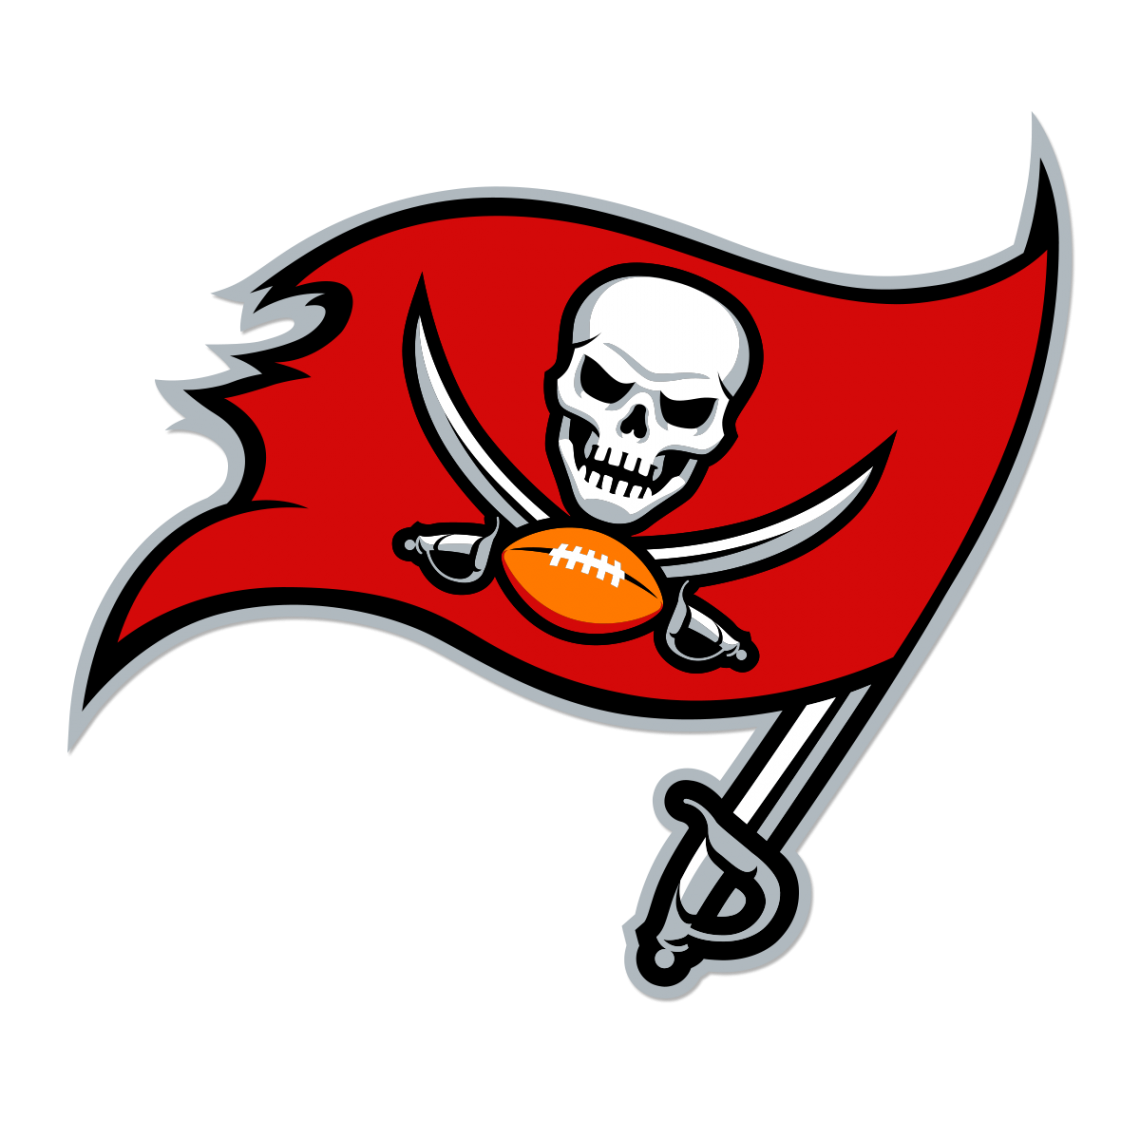 Daddy's Hangout 2021 Week 1 NFL Predictions